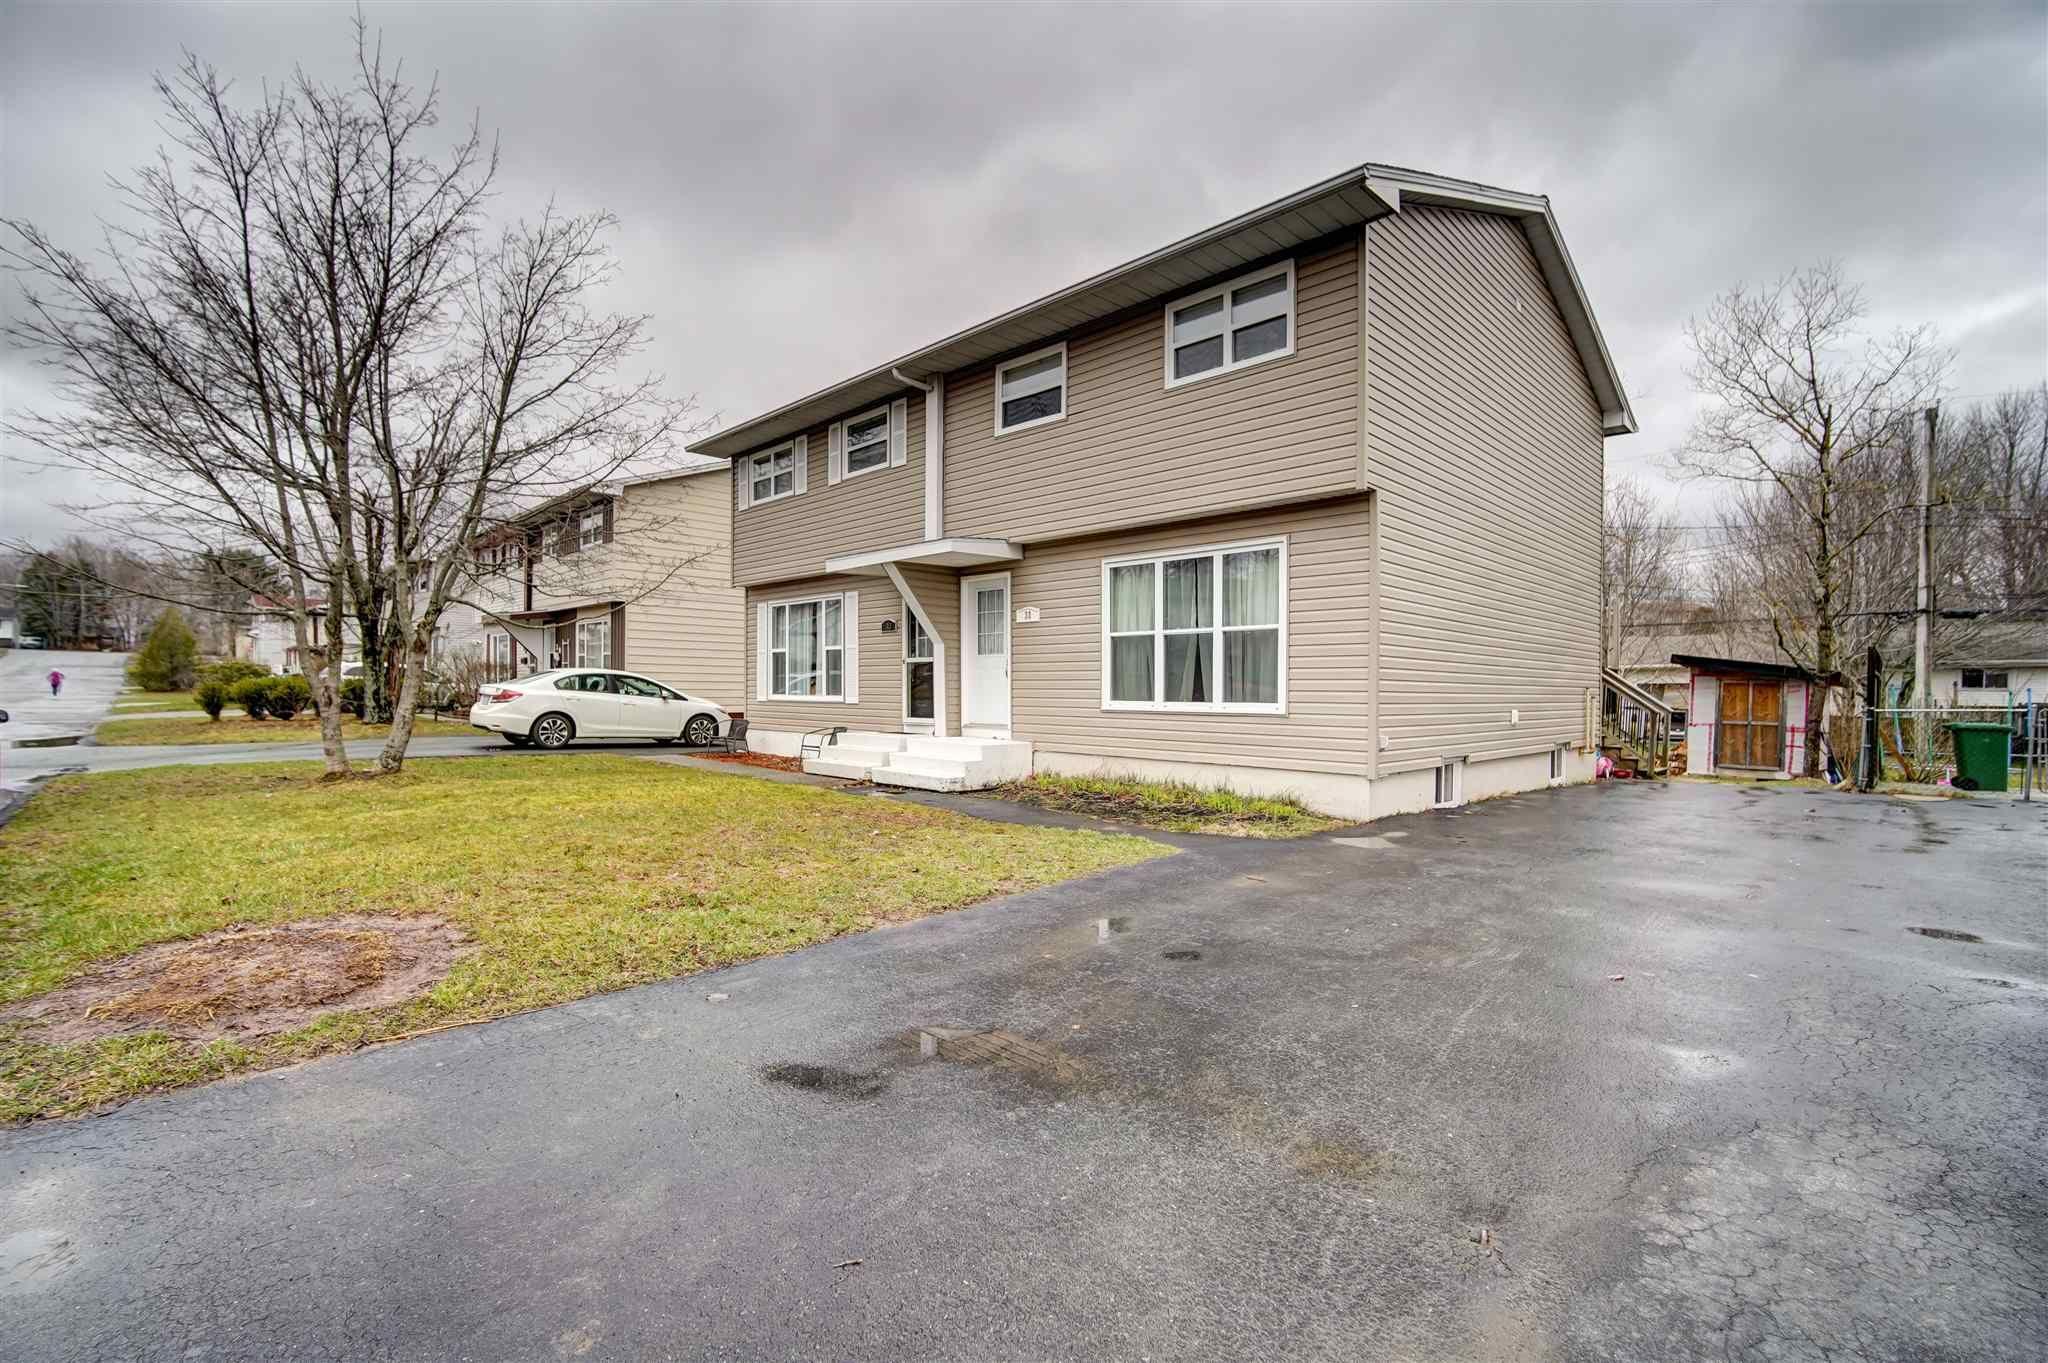 Main Photo: 32 Langevin Drive in Lower Sackville: 25-Sackville Residential for sale (Halifax-Dartmouth)  : MLS®# 202107655